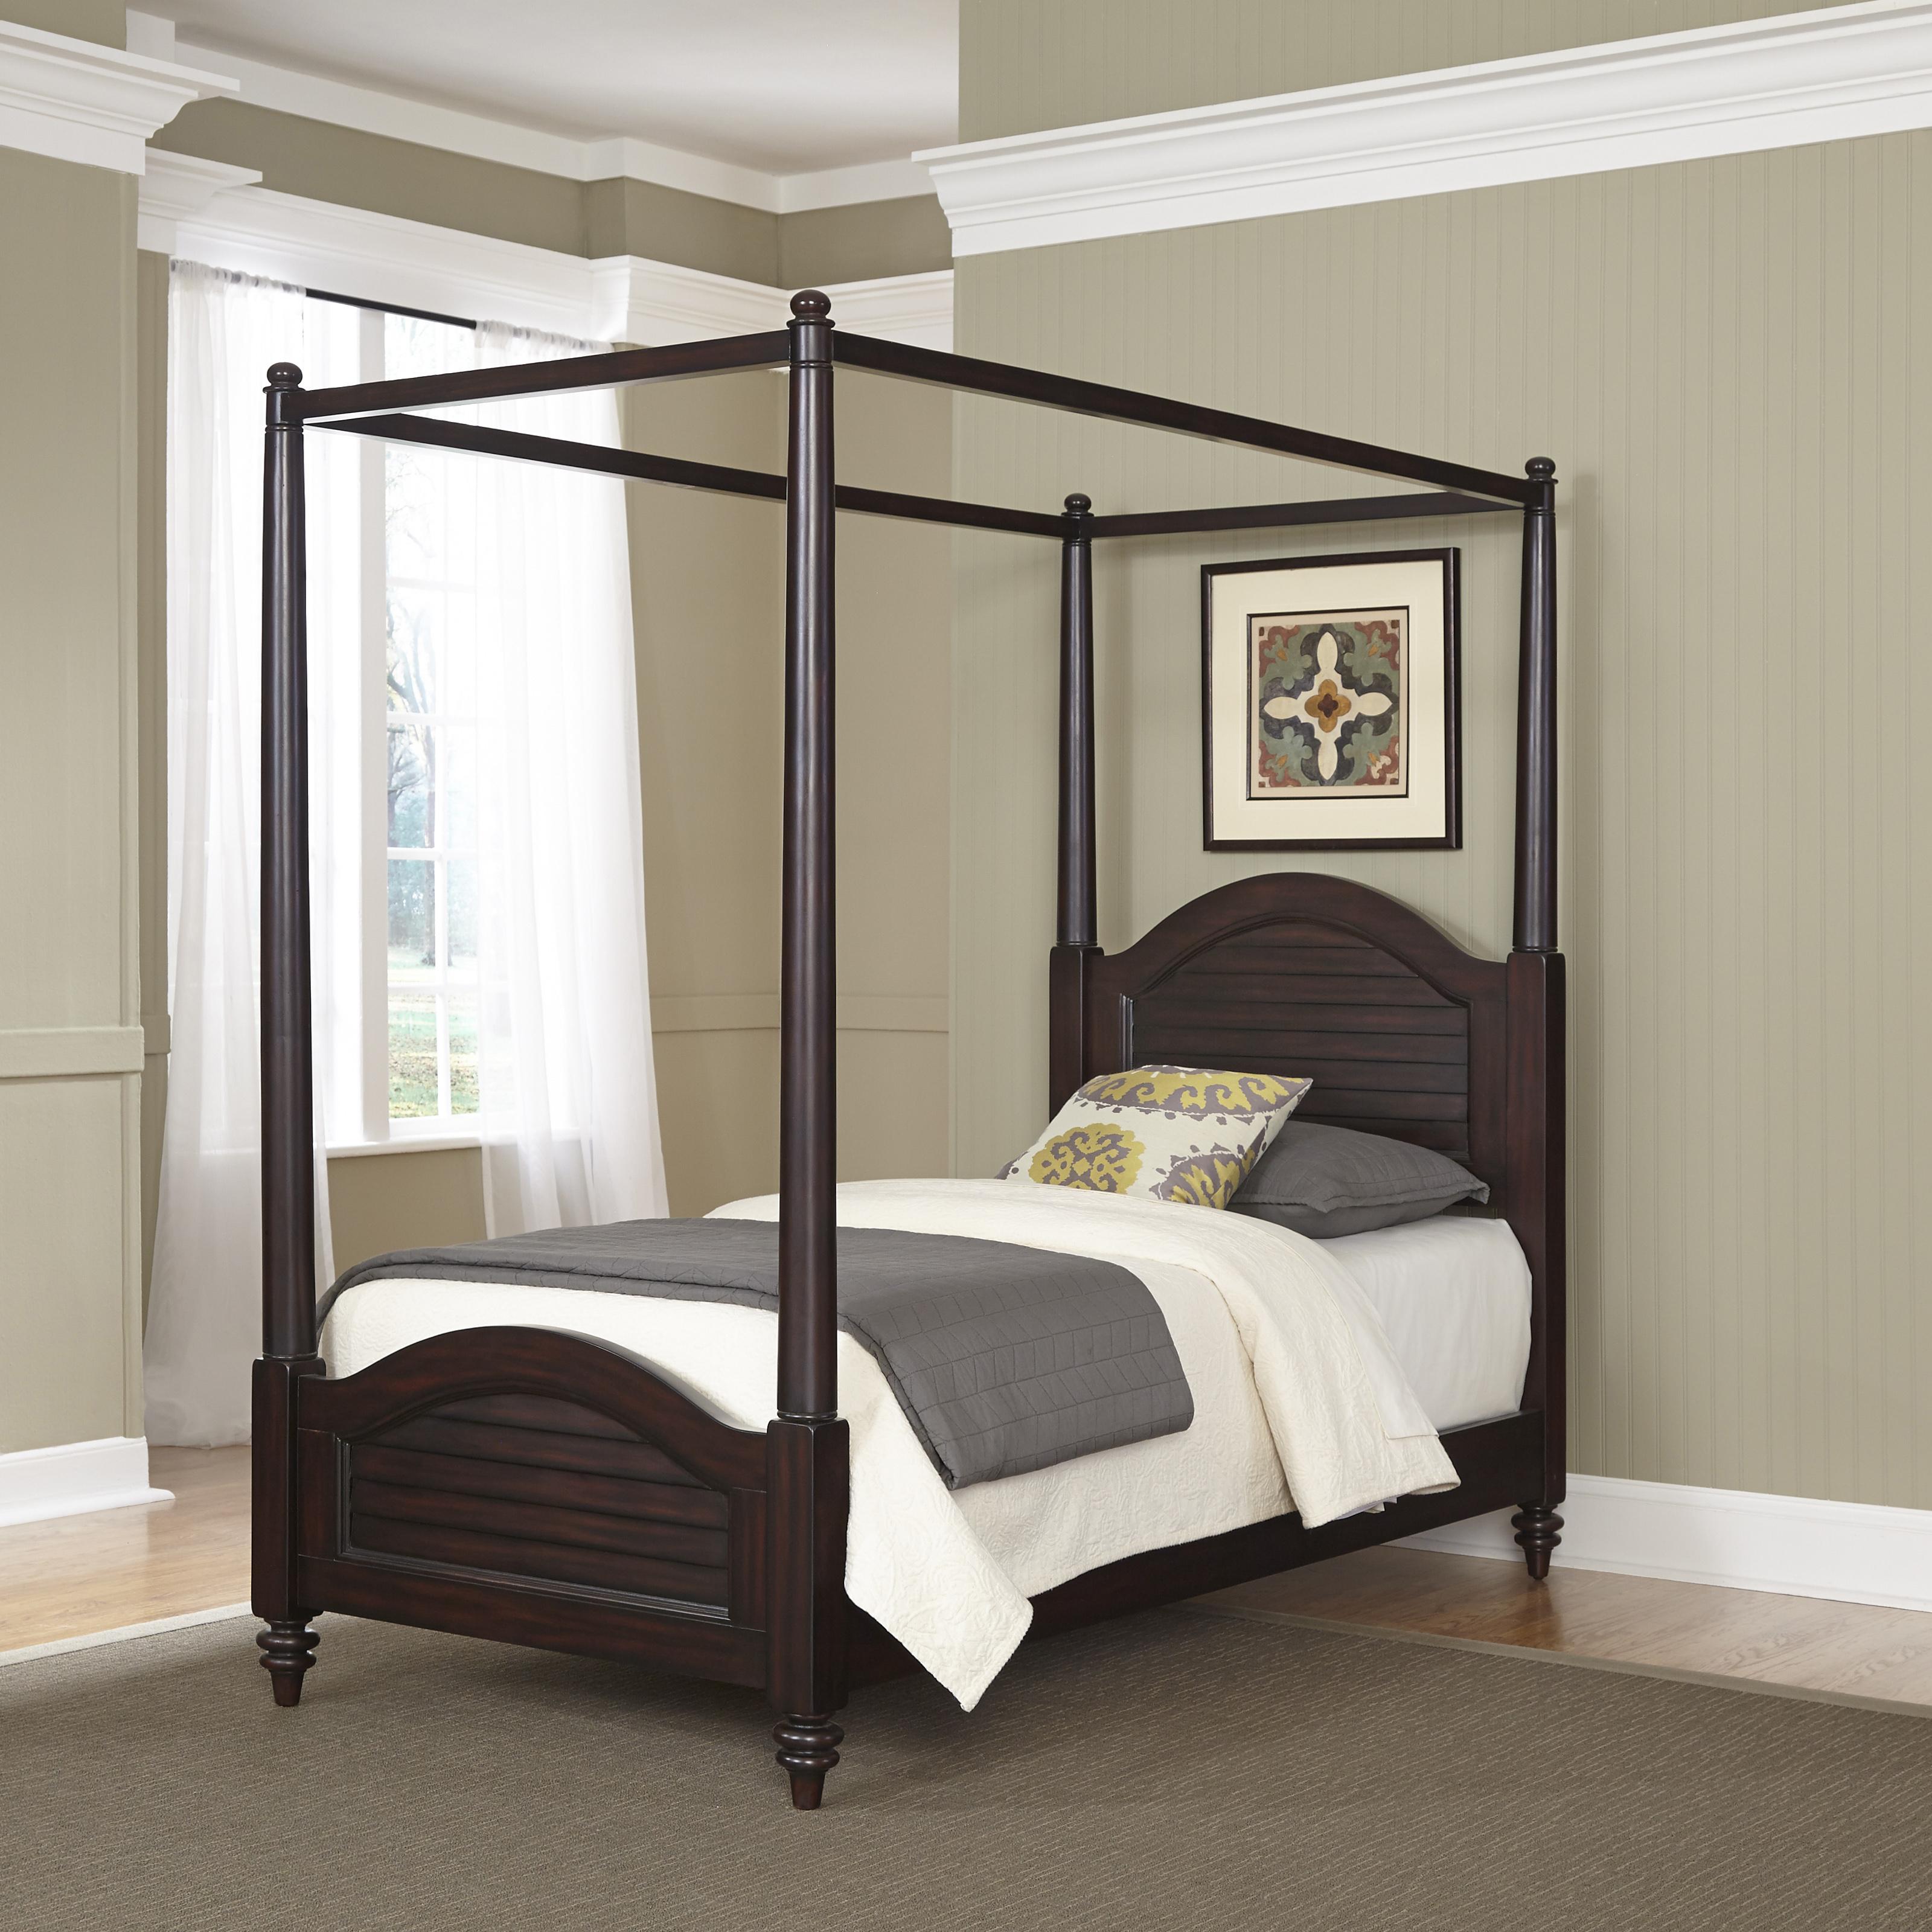 Home Styles Bermuda Espresso Twin Canopy Bed